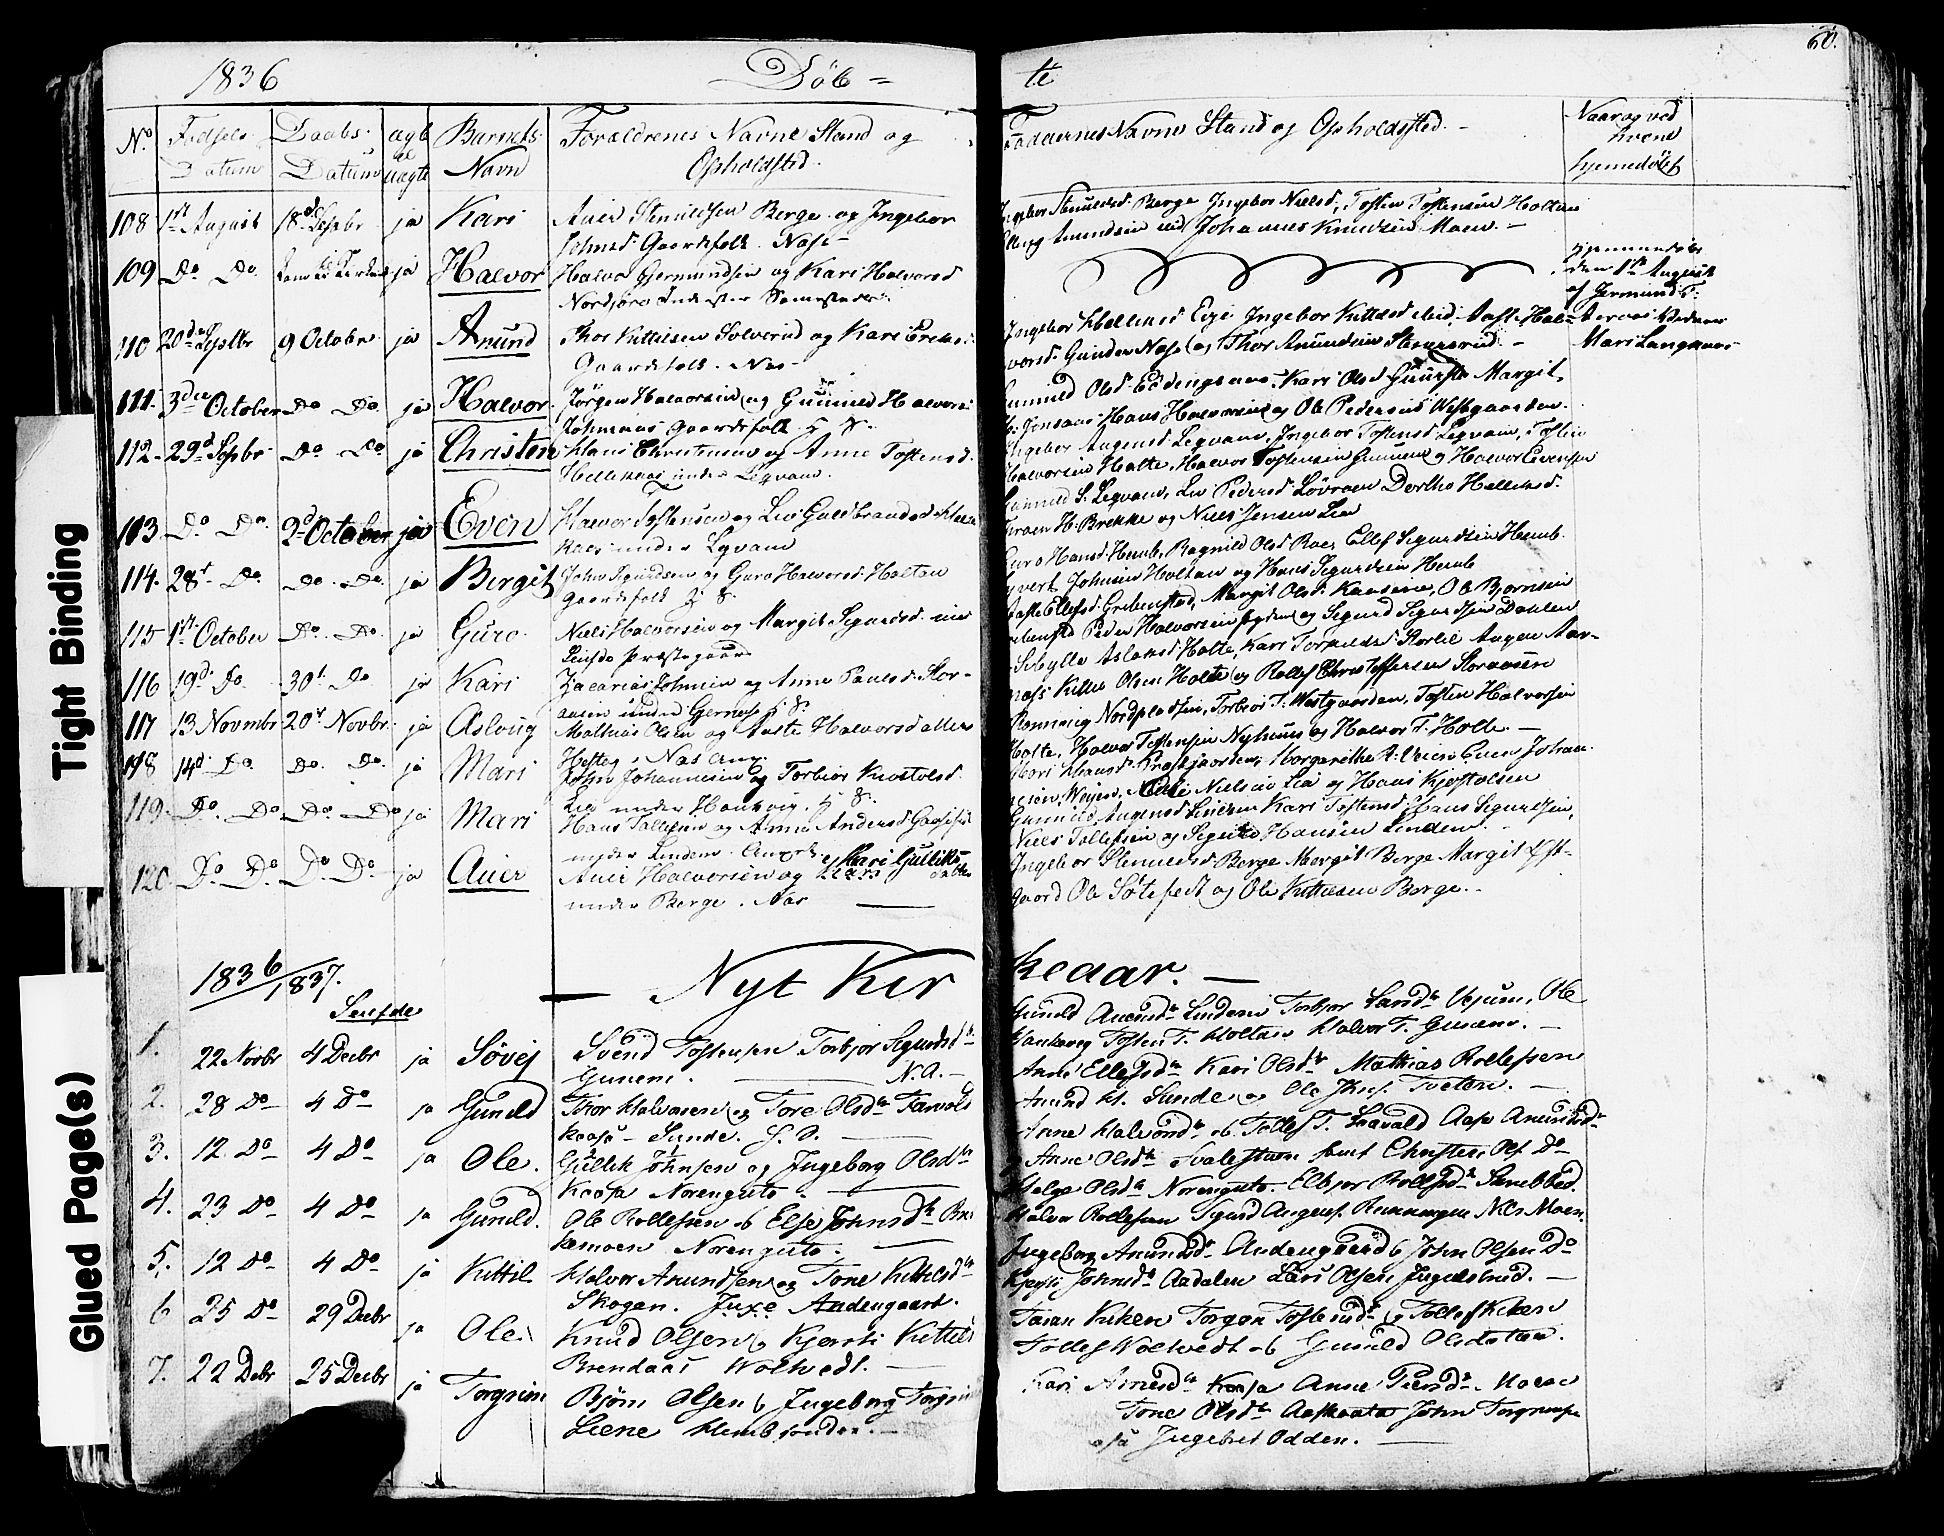 SAKO, Sauherad kirkebøker, F/Fa/L0006: Ministerialbok nr. I 6, 1827-1850, s. 60